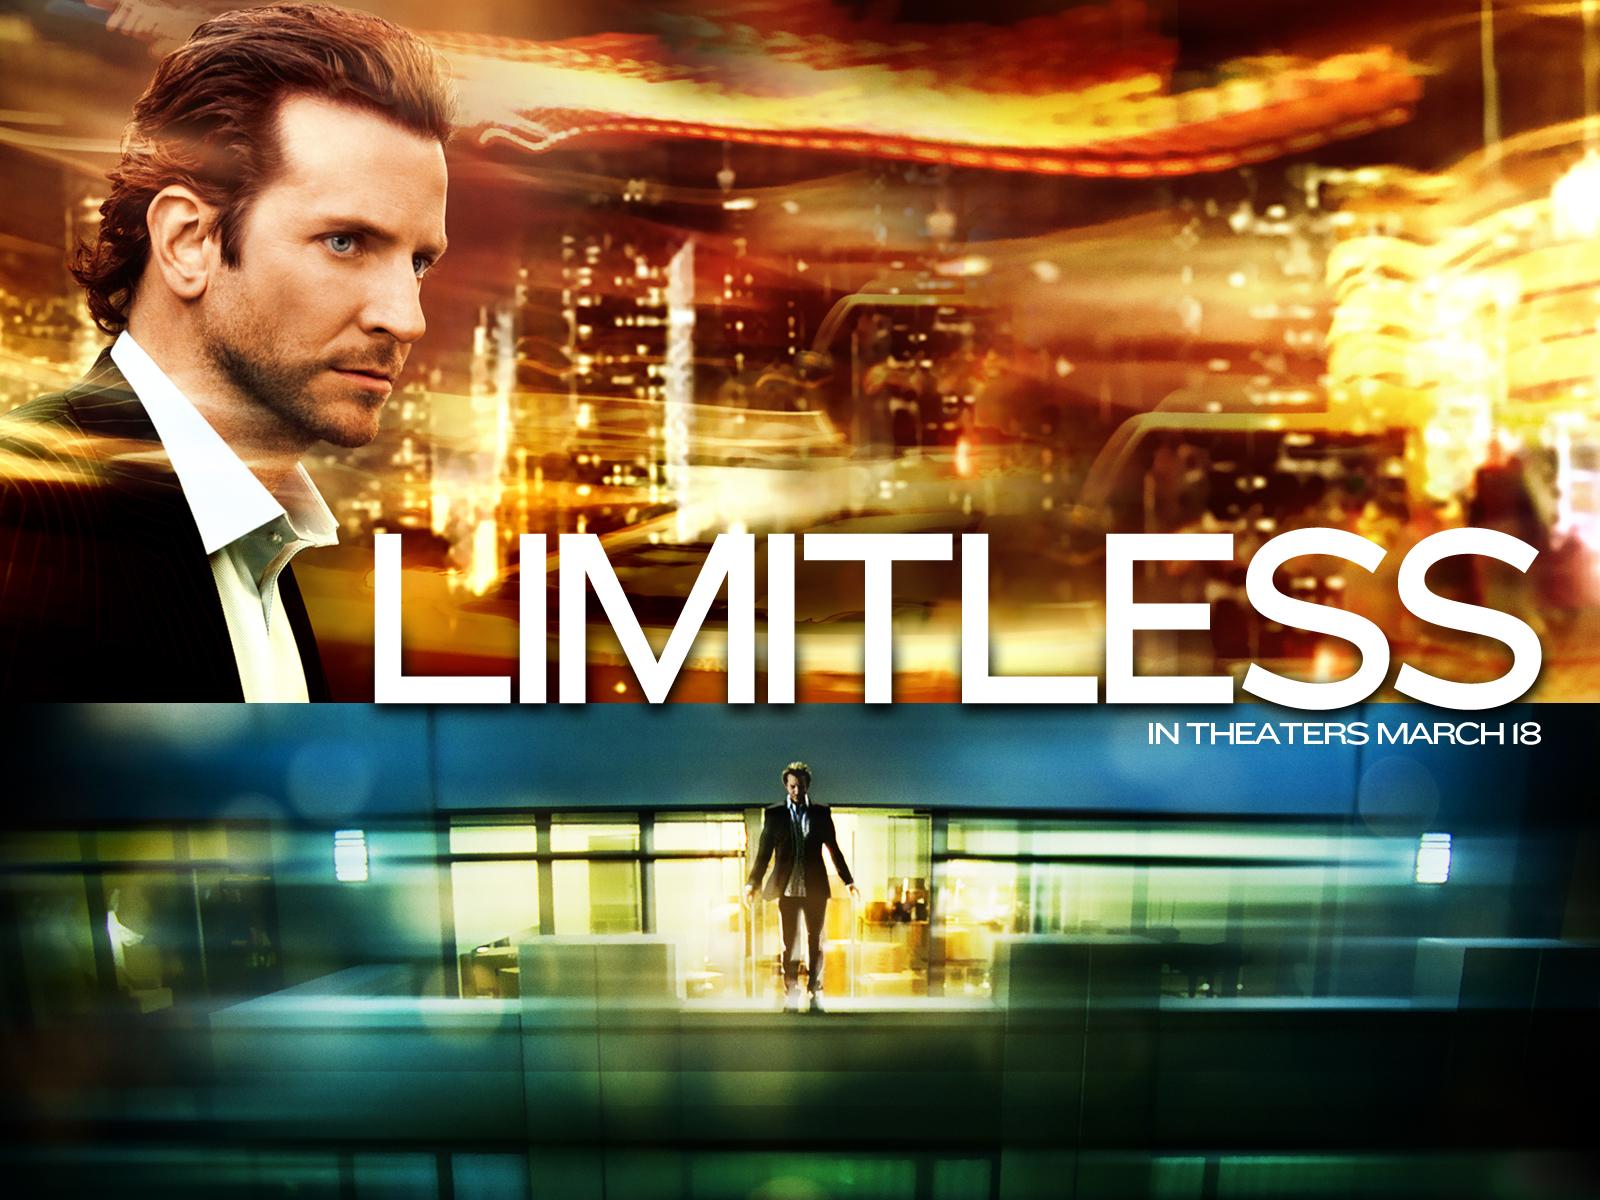 http://3.bp.blogspot.com/-BrsqrHk49jg/TbztB_5wTpI/AAAAAAAAADI/PKrUtxuKLI0/s1600/Bradley_Cooper_in_Limitless_Wallpaper_1_800.jpg